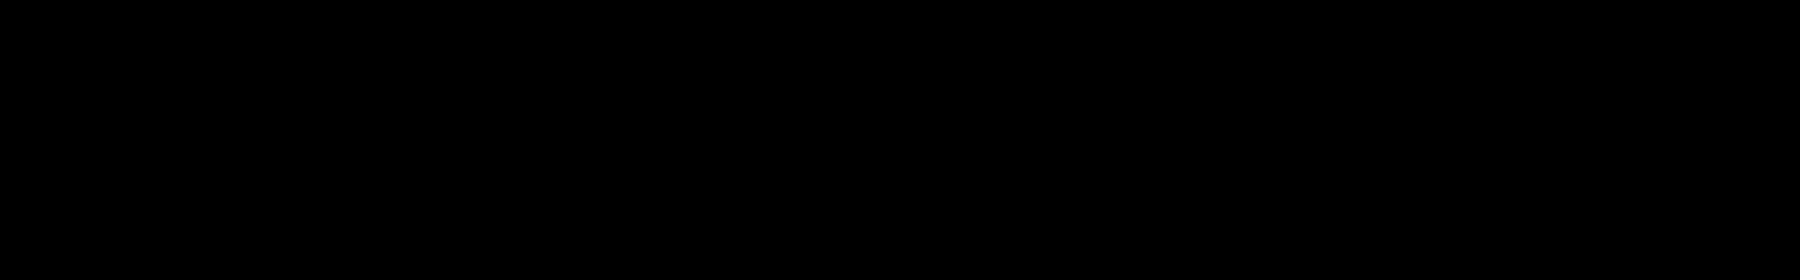 Persian Samples audio waveform